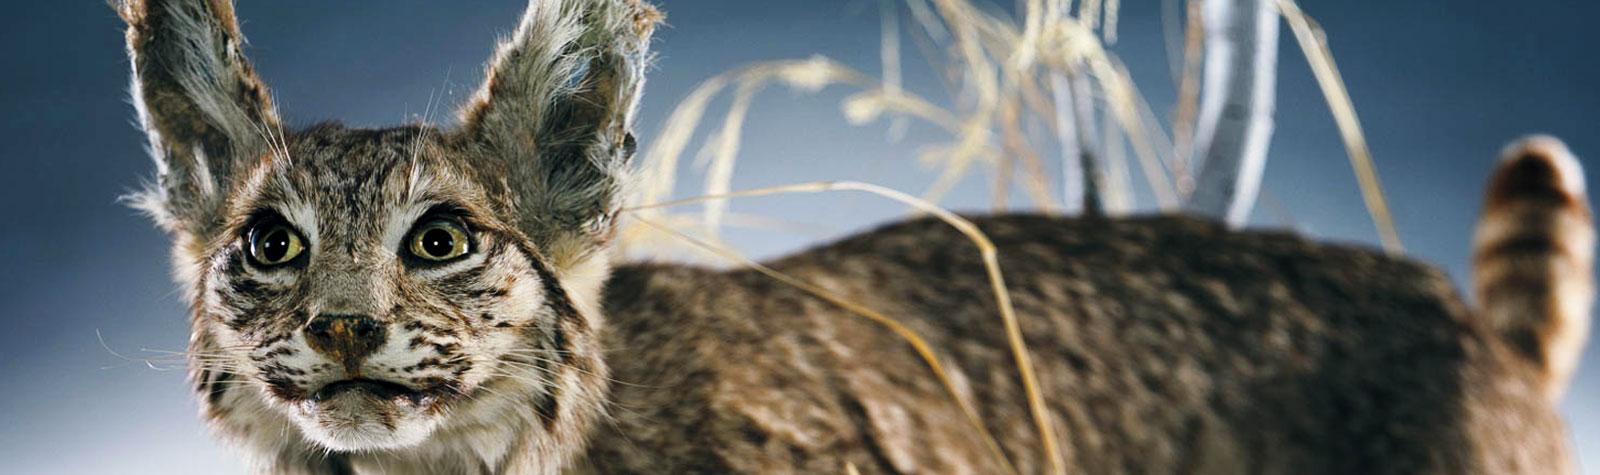 Photo of bobcat by Amanda Keller Konya for photography department